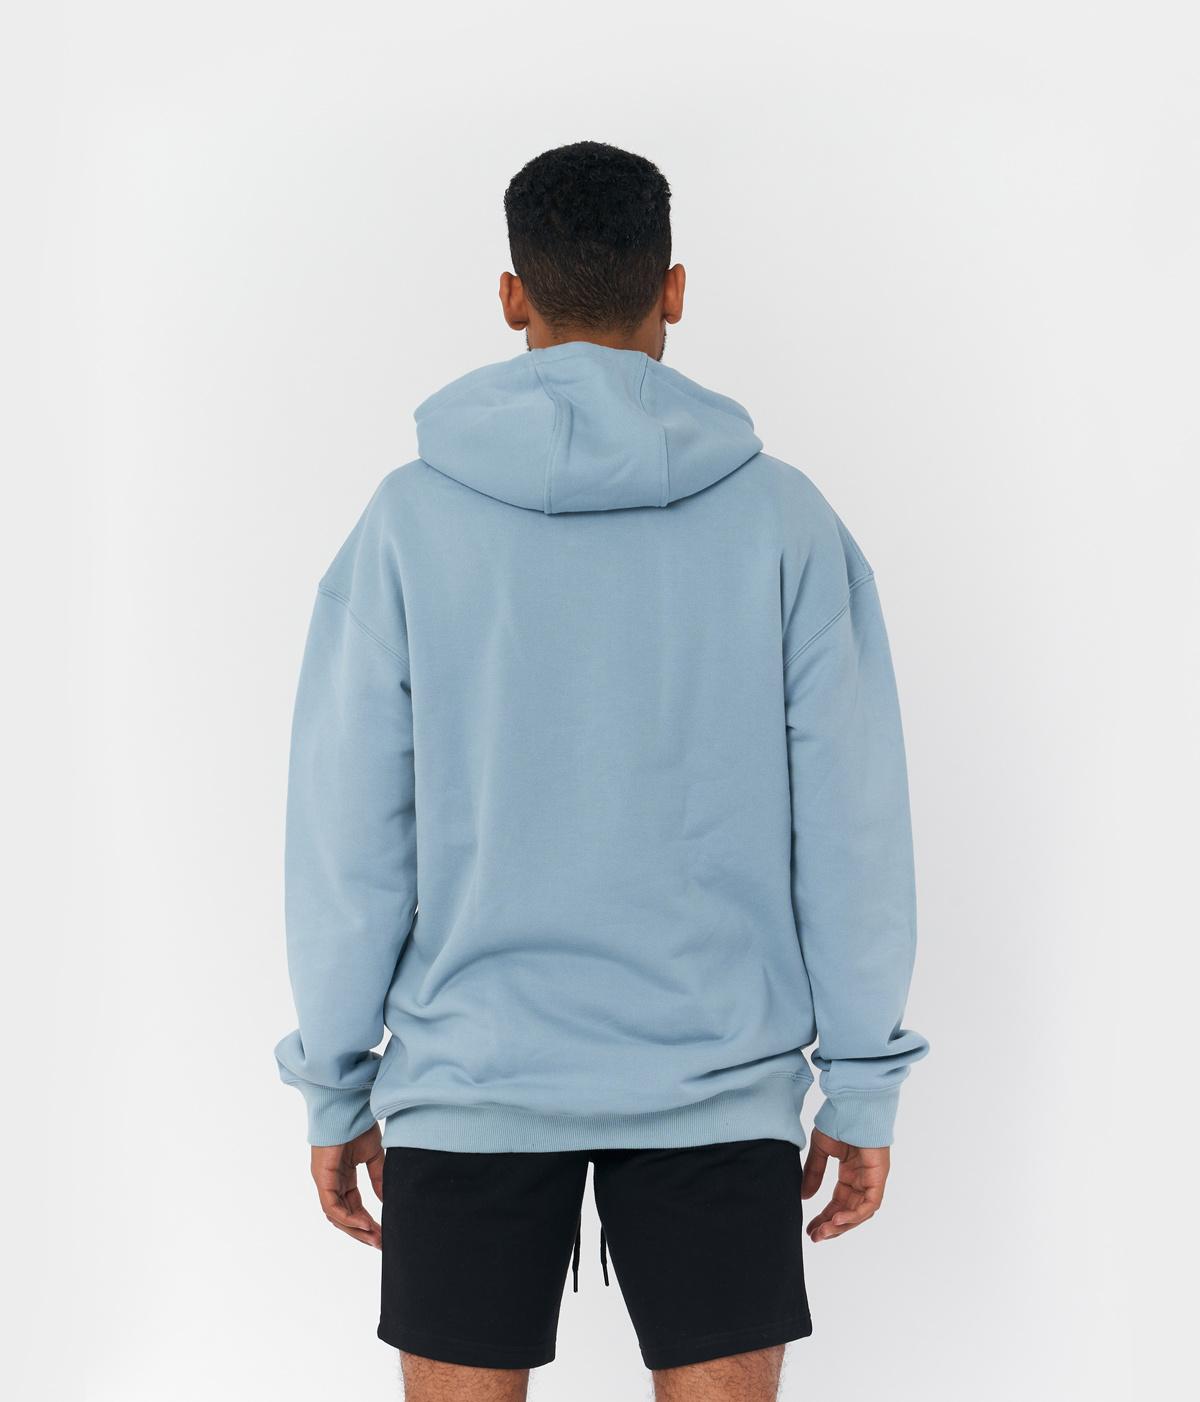 PS Light Blue Logo Hoodie